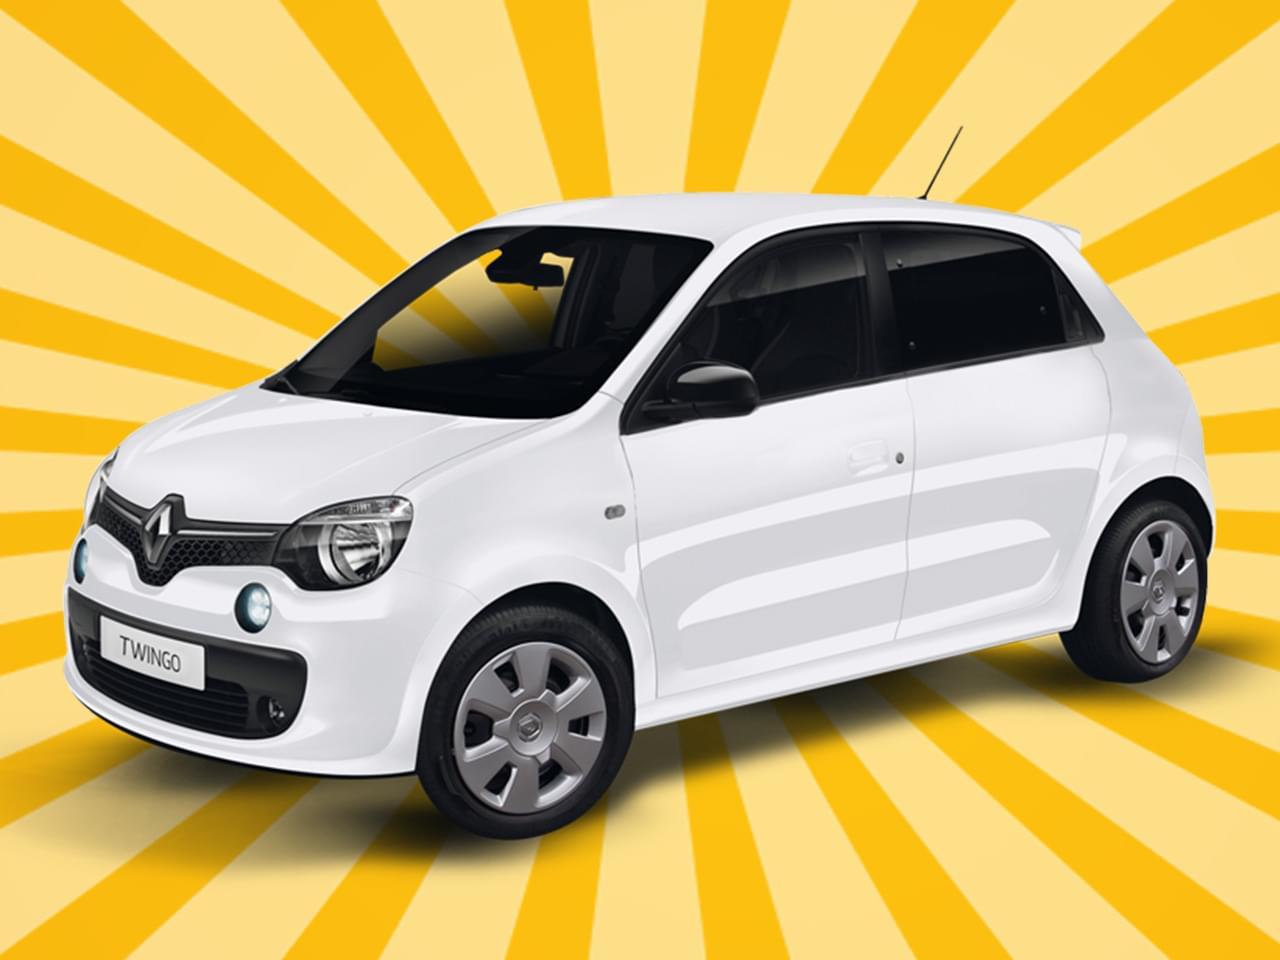 [Gewerbeleasing] Renault Twingo Limited SCe 65 (65 PS) mtl. 25€ + 399€ ÜF (eff. mtl. 58,25€), LF 0,22, GF 0,51, 12 Monate